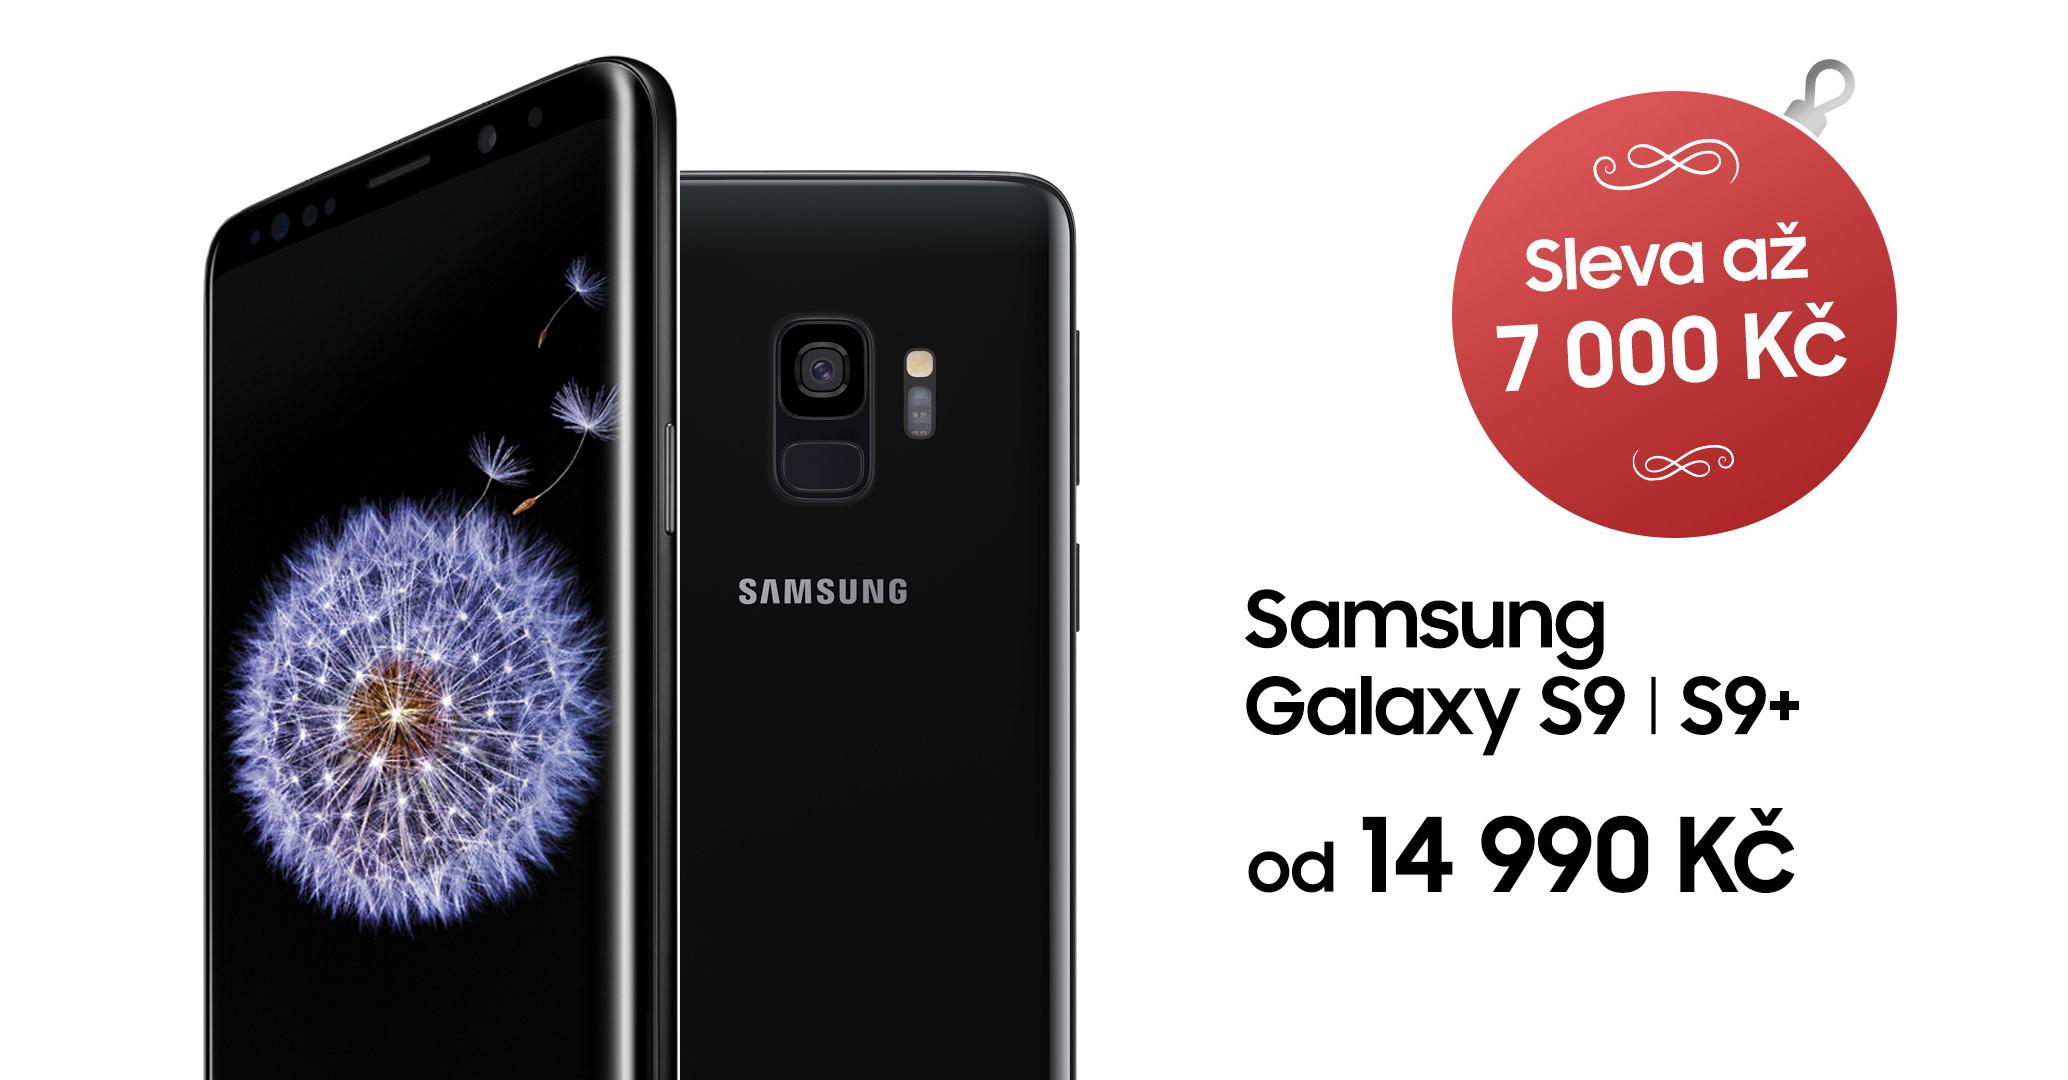 Samsung Galaxy S9 sleva 7000 kc